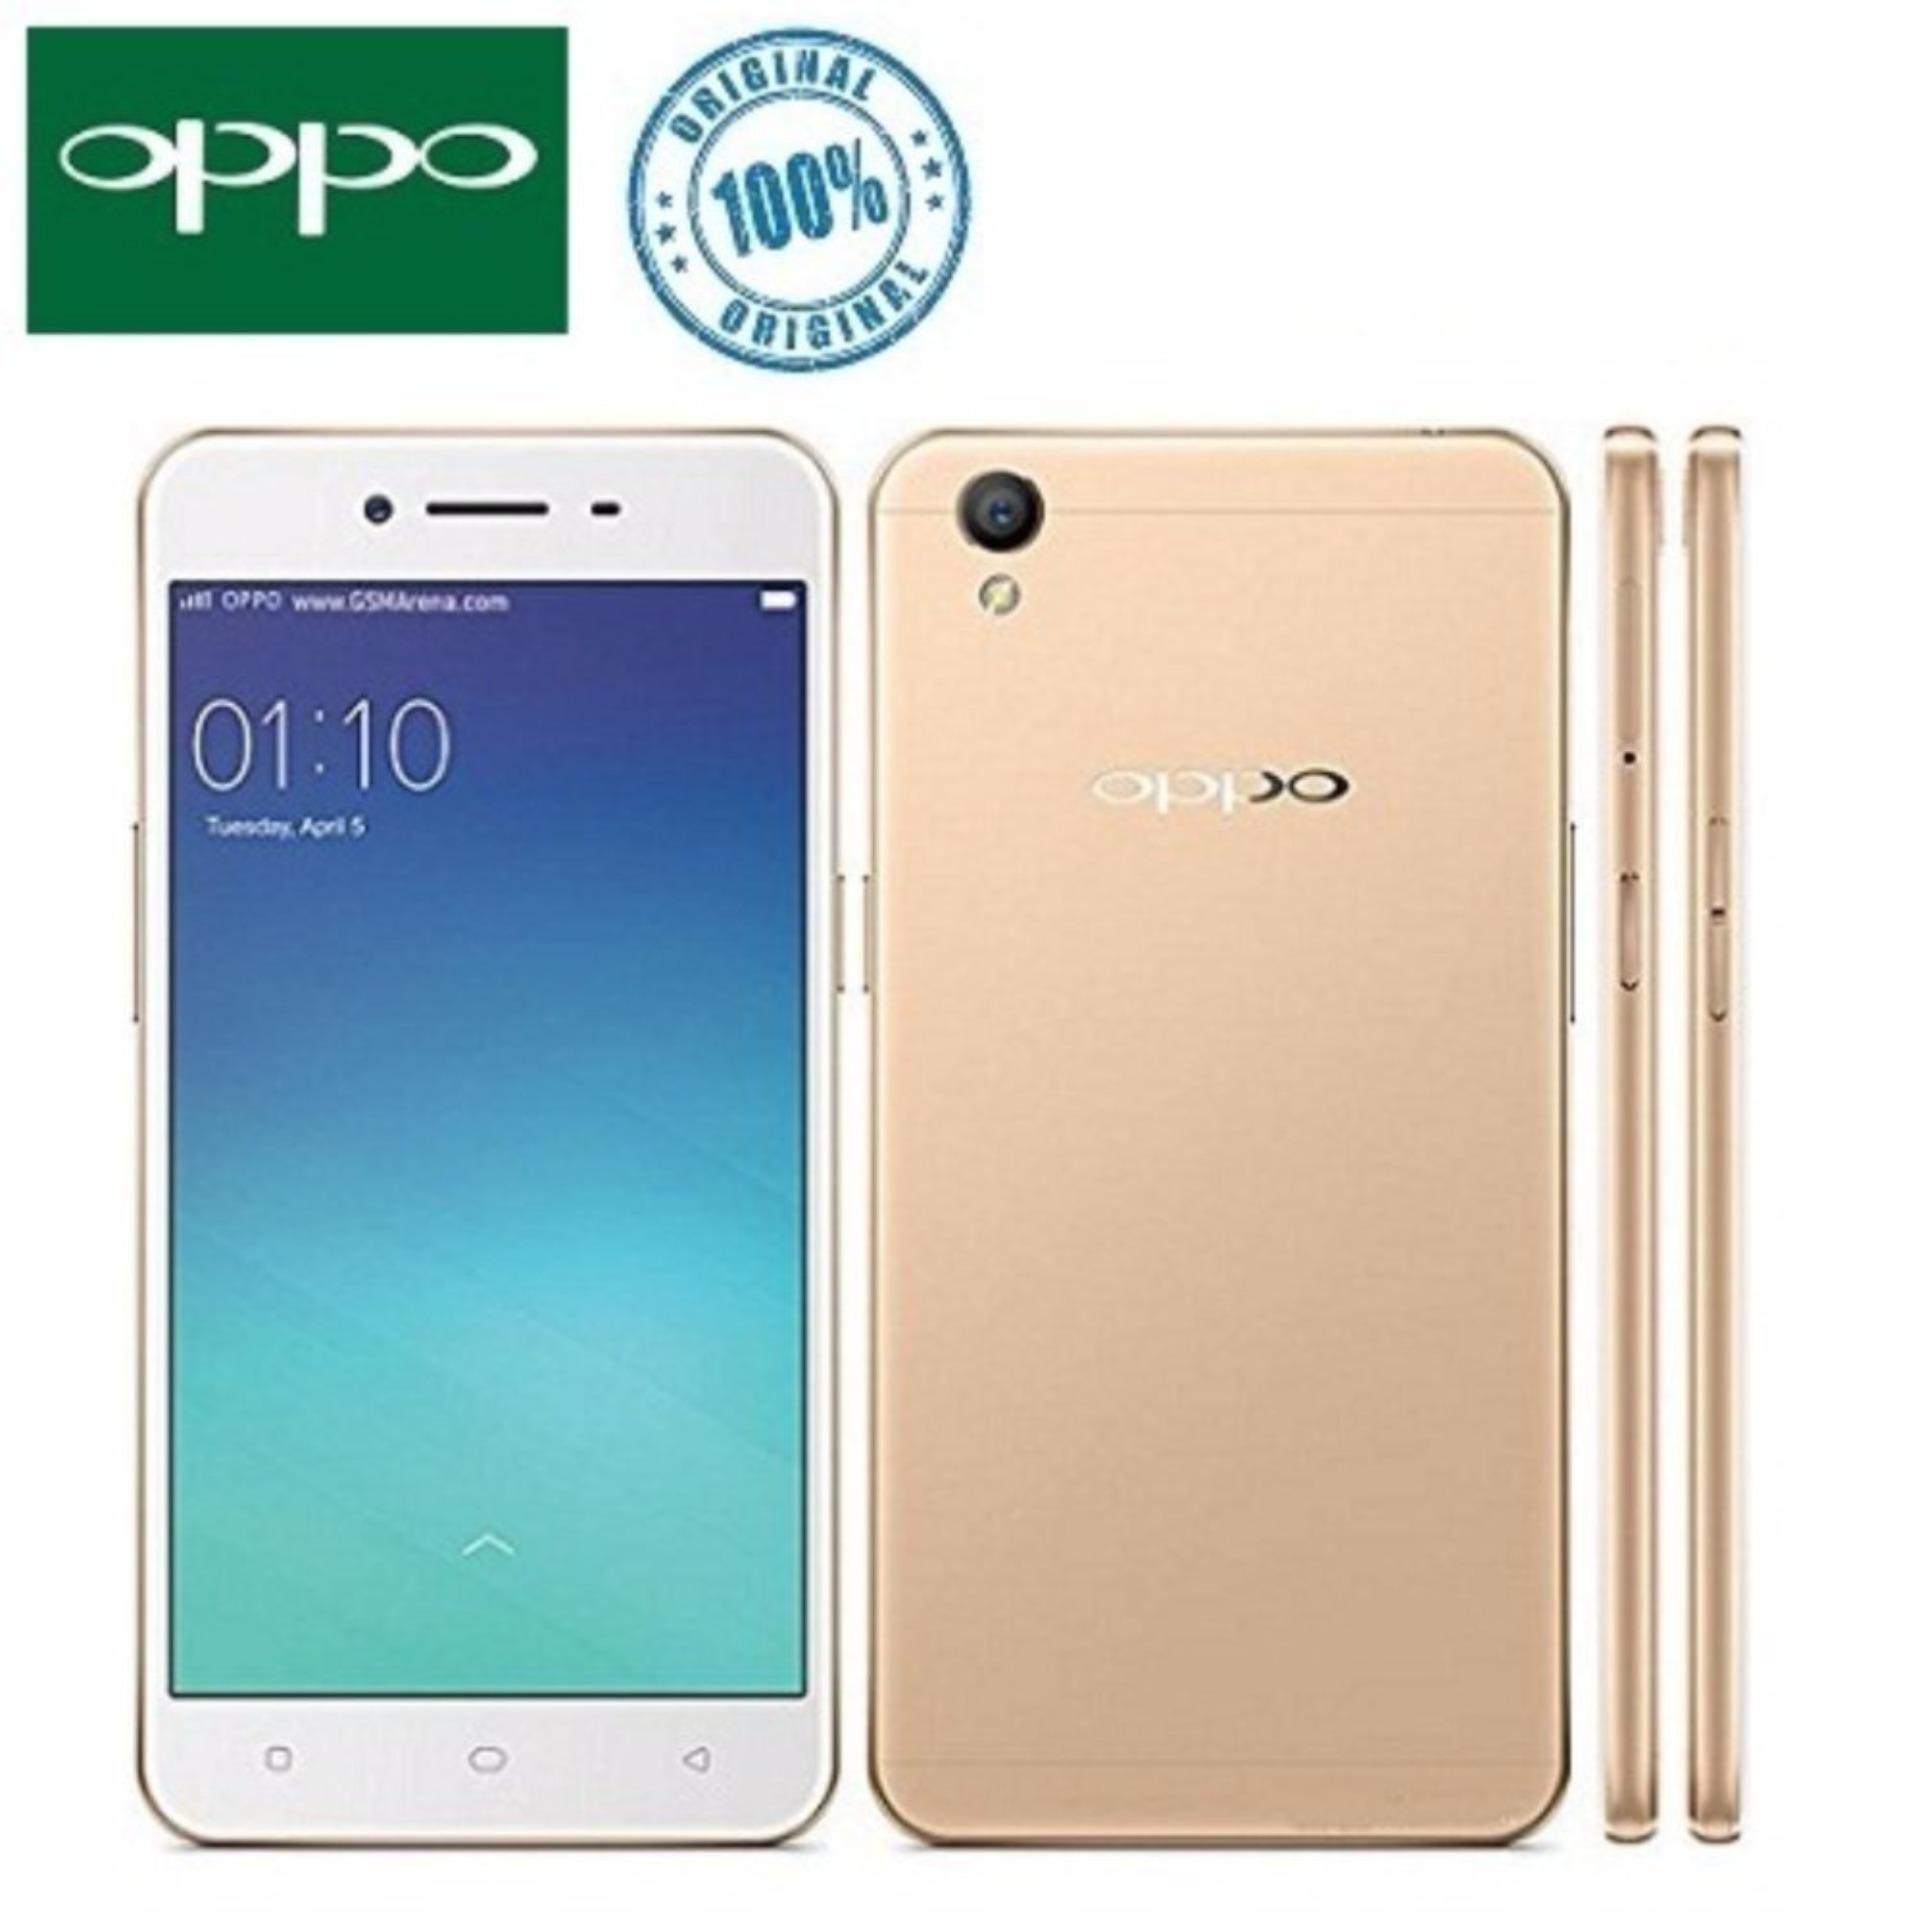 OPPO A37F 4G LTE 16GB - Gold